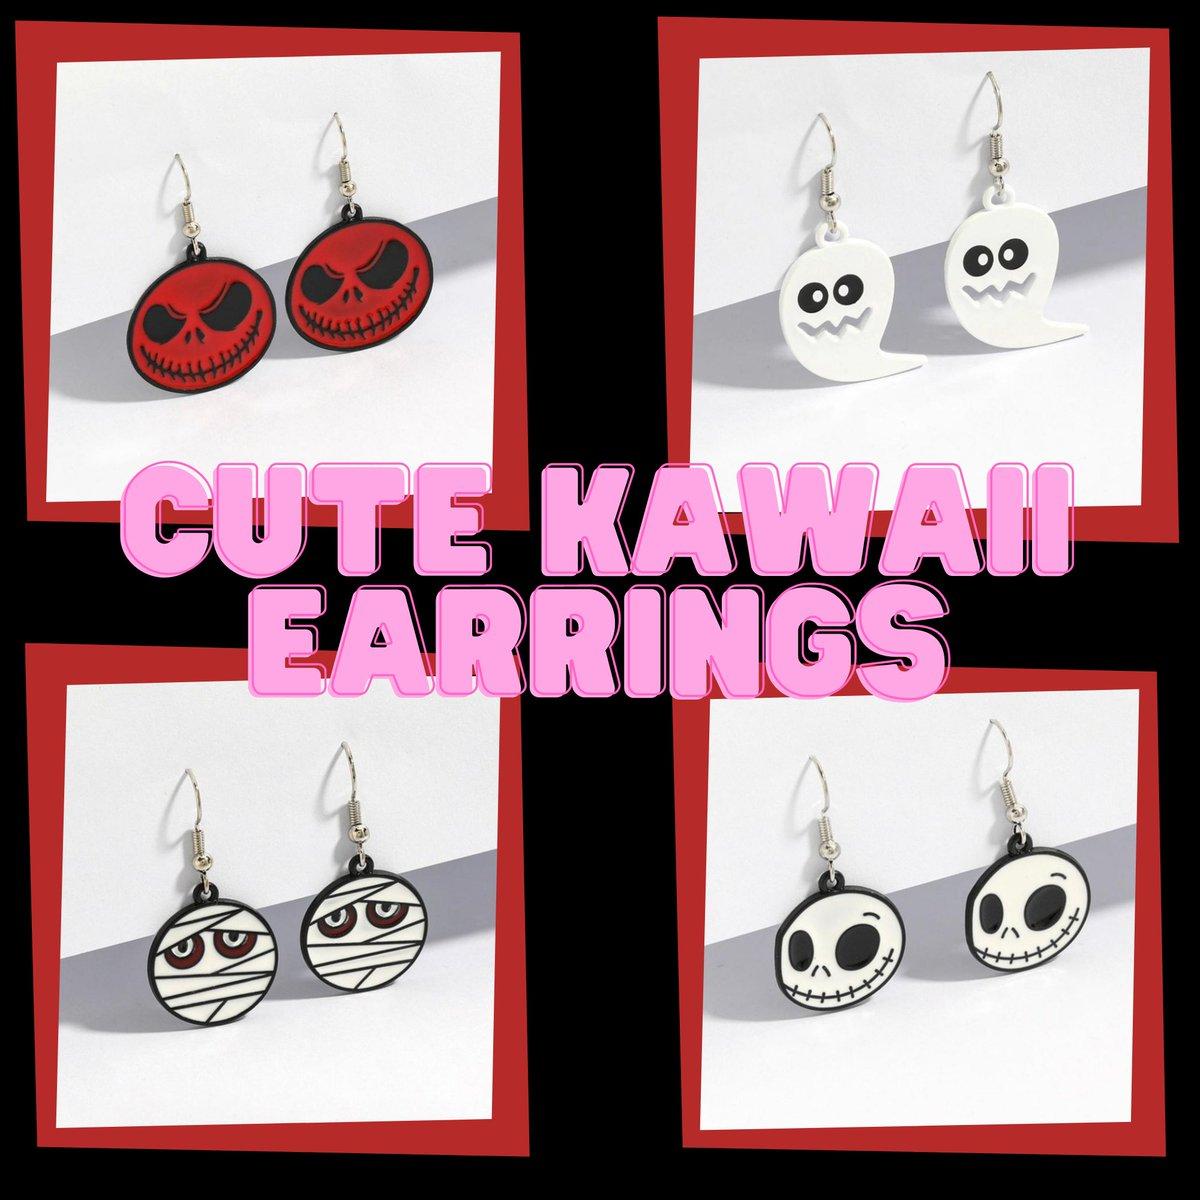 Shop Kawaii Earrings at   #fashion #style #stylish #earrings #pretty #alternativegirl #gothicaesthetic #gothicstyle #styles #outfit #shopping #pastelgoth #nugoth #tradgoth #Egirls #kawaii #darkgrunge #darkfashion #HARAJUKU~天使がくれた七日間~ #emo